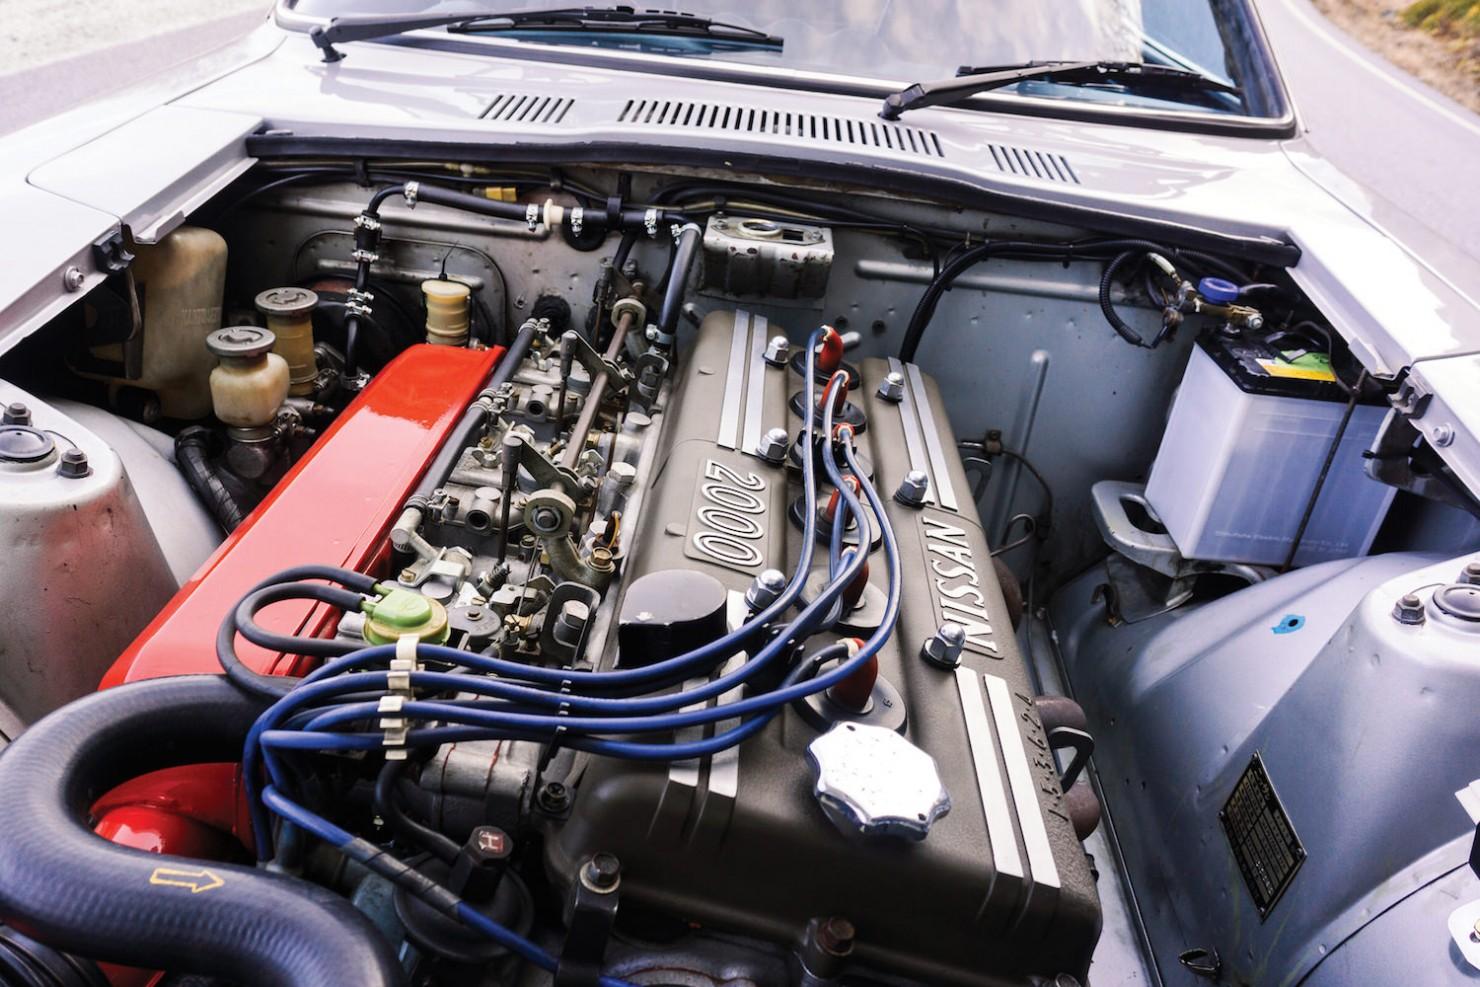 Nissan-Fairlady-Z-432-3